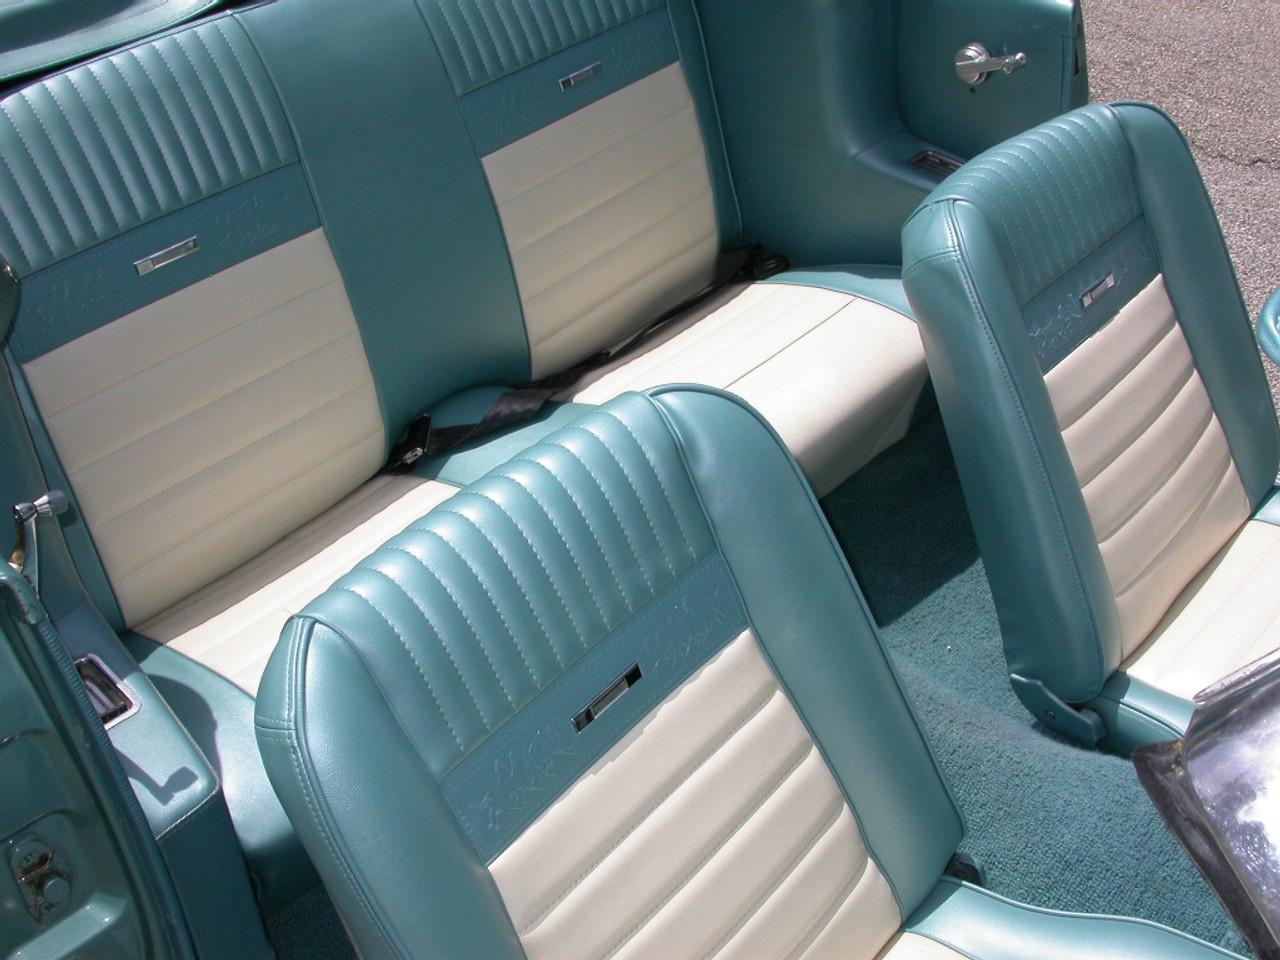 Sensational 1965 66 Seat Upholstery Full Set Pony Tmi Ibusinesslaw Wood Chair Design Ideas Ibusinesslaworg